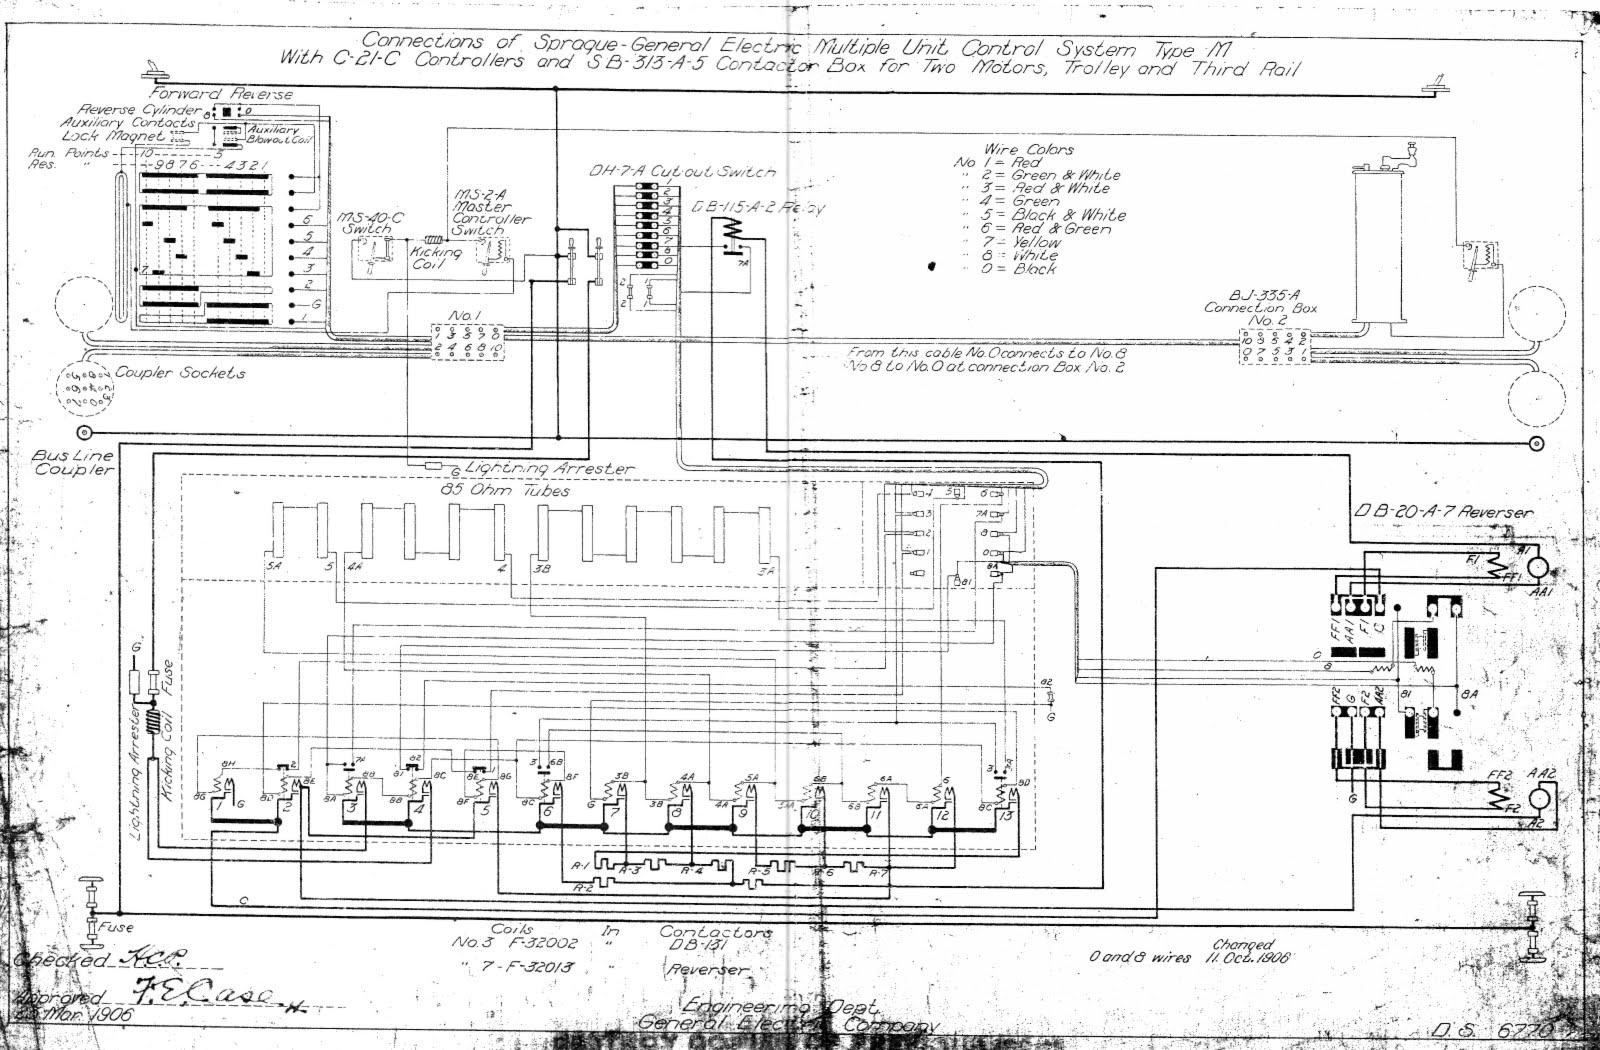 1984 dodge 318 ignition wiring diagram 0900c1528006af87 likewise moreover together with moreover [ 1600 x 1050 Pixel ]